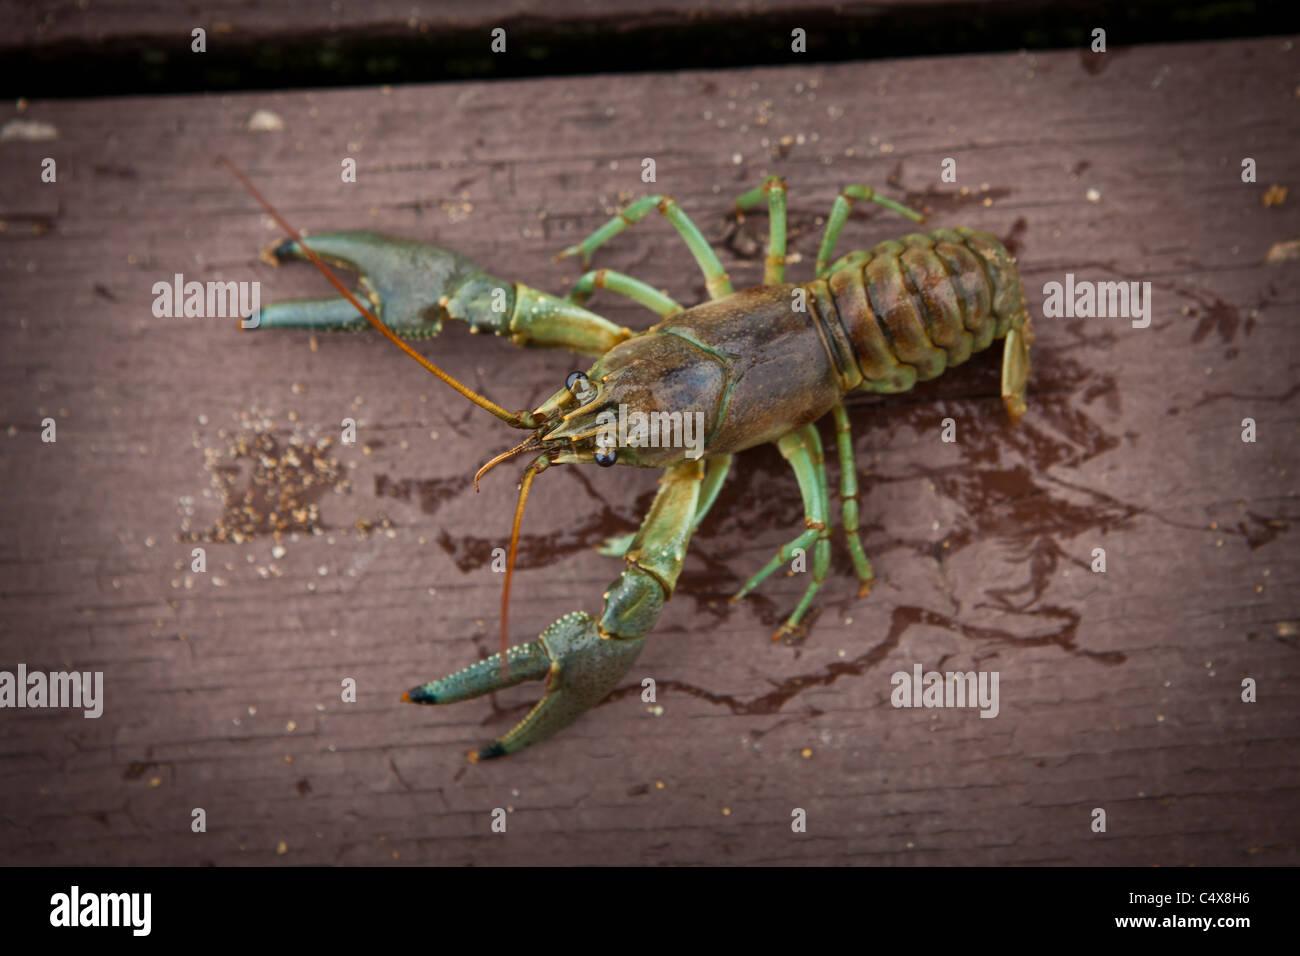 Rusty crayfish (Orconectes rusticus) Boulder Junction, Wisconsin. - Stock Image